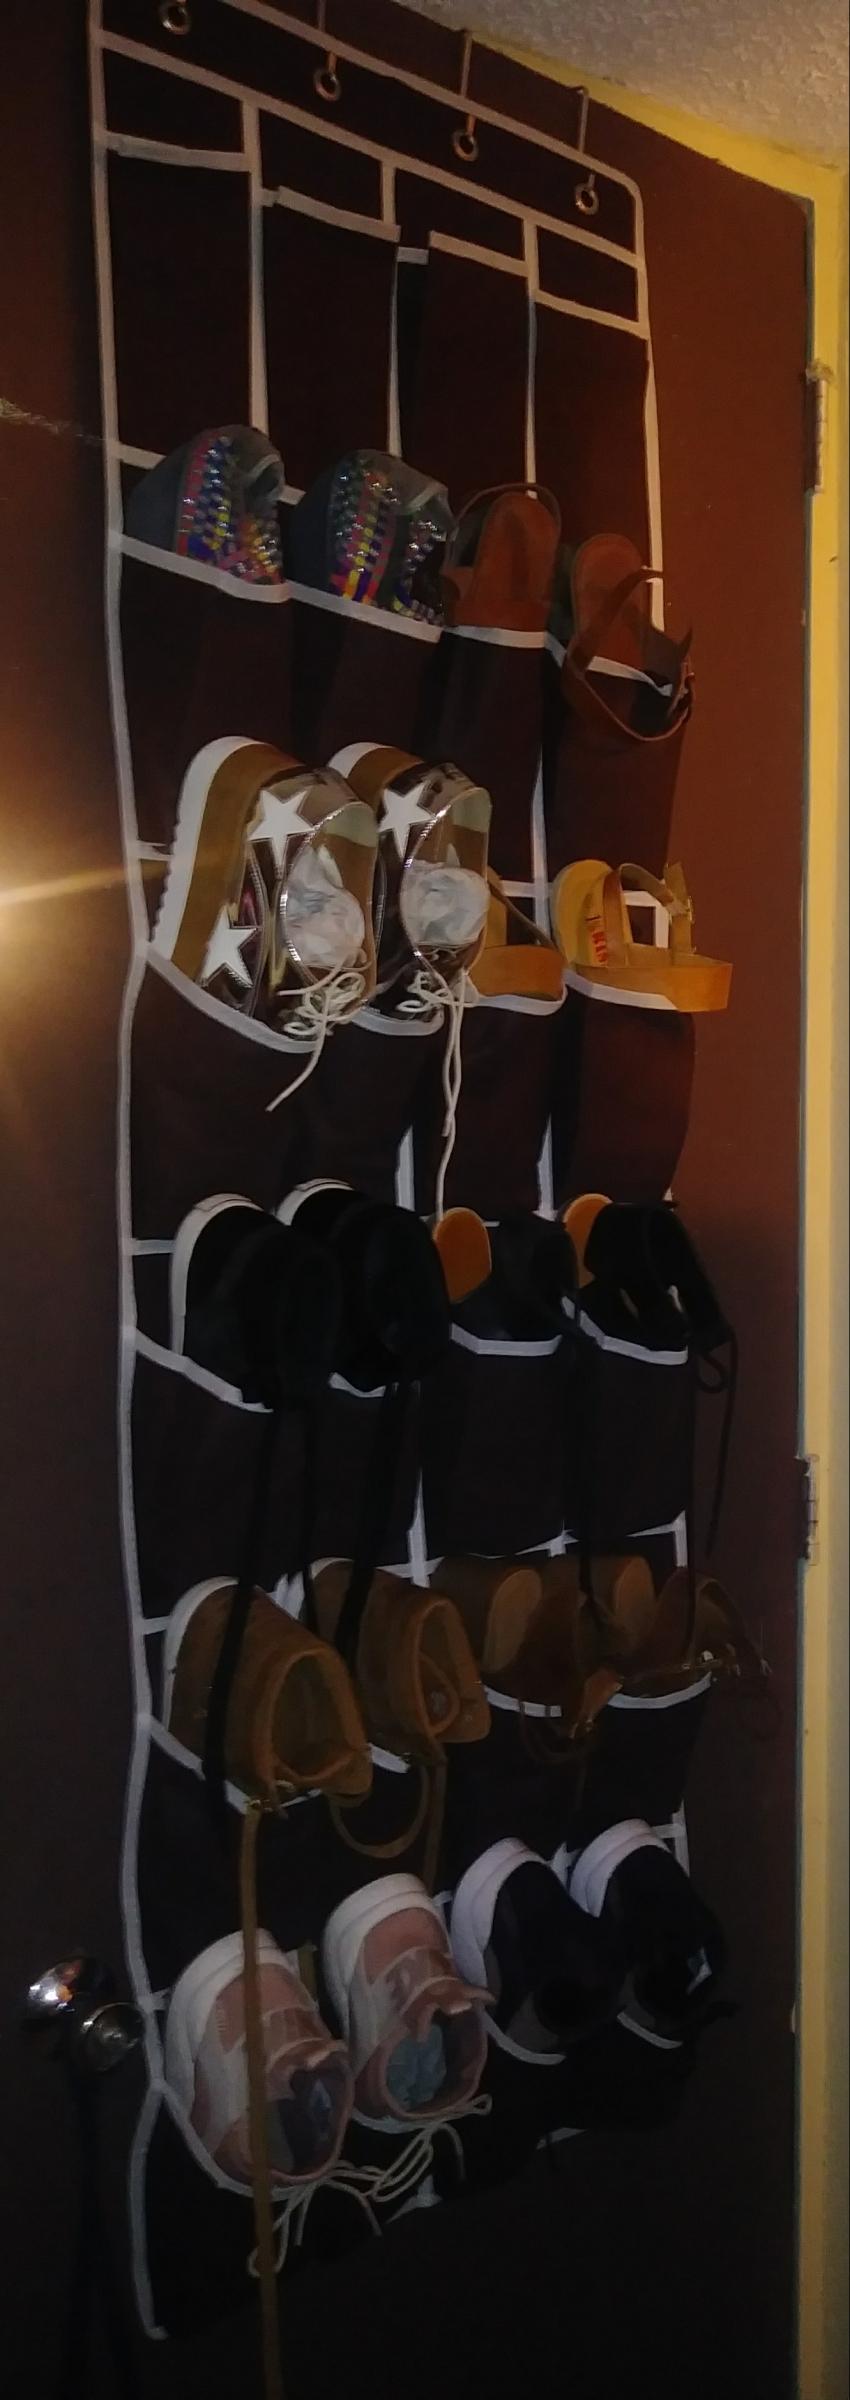 Shoes organizar